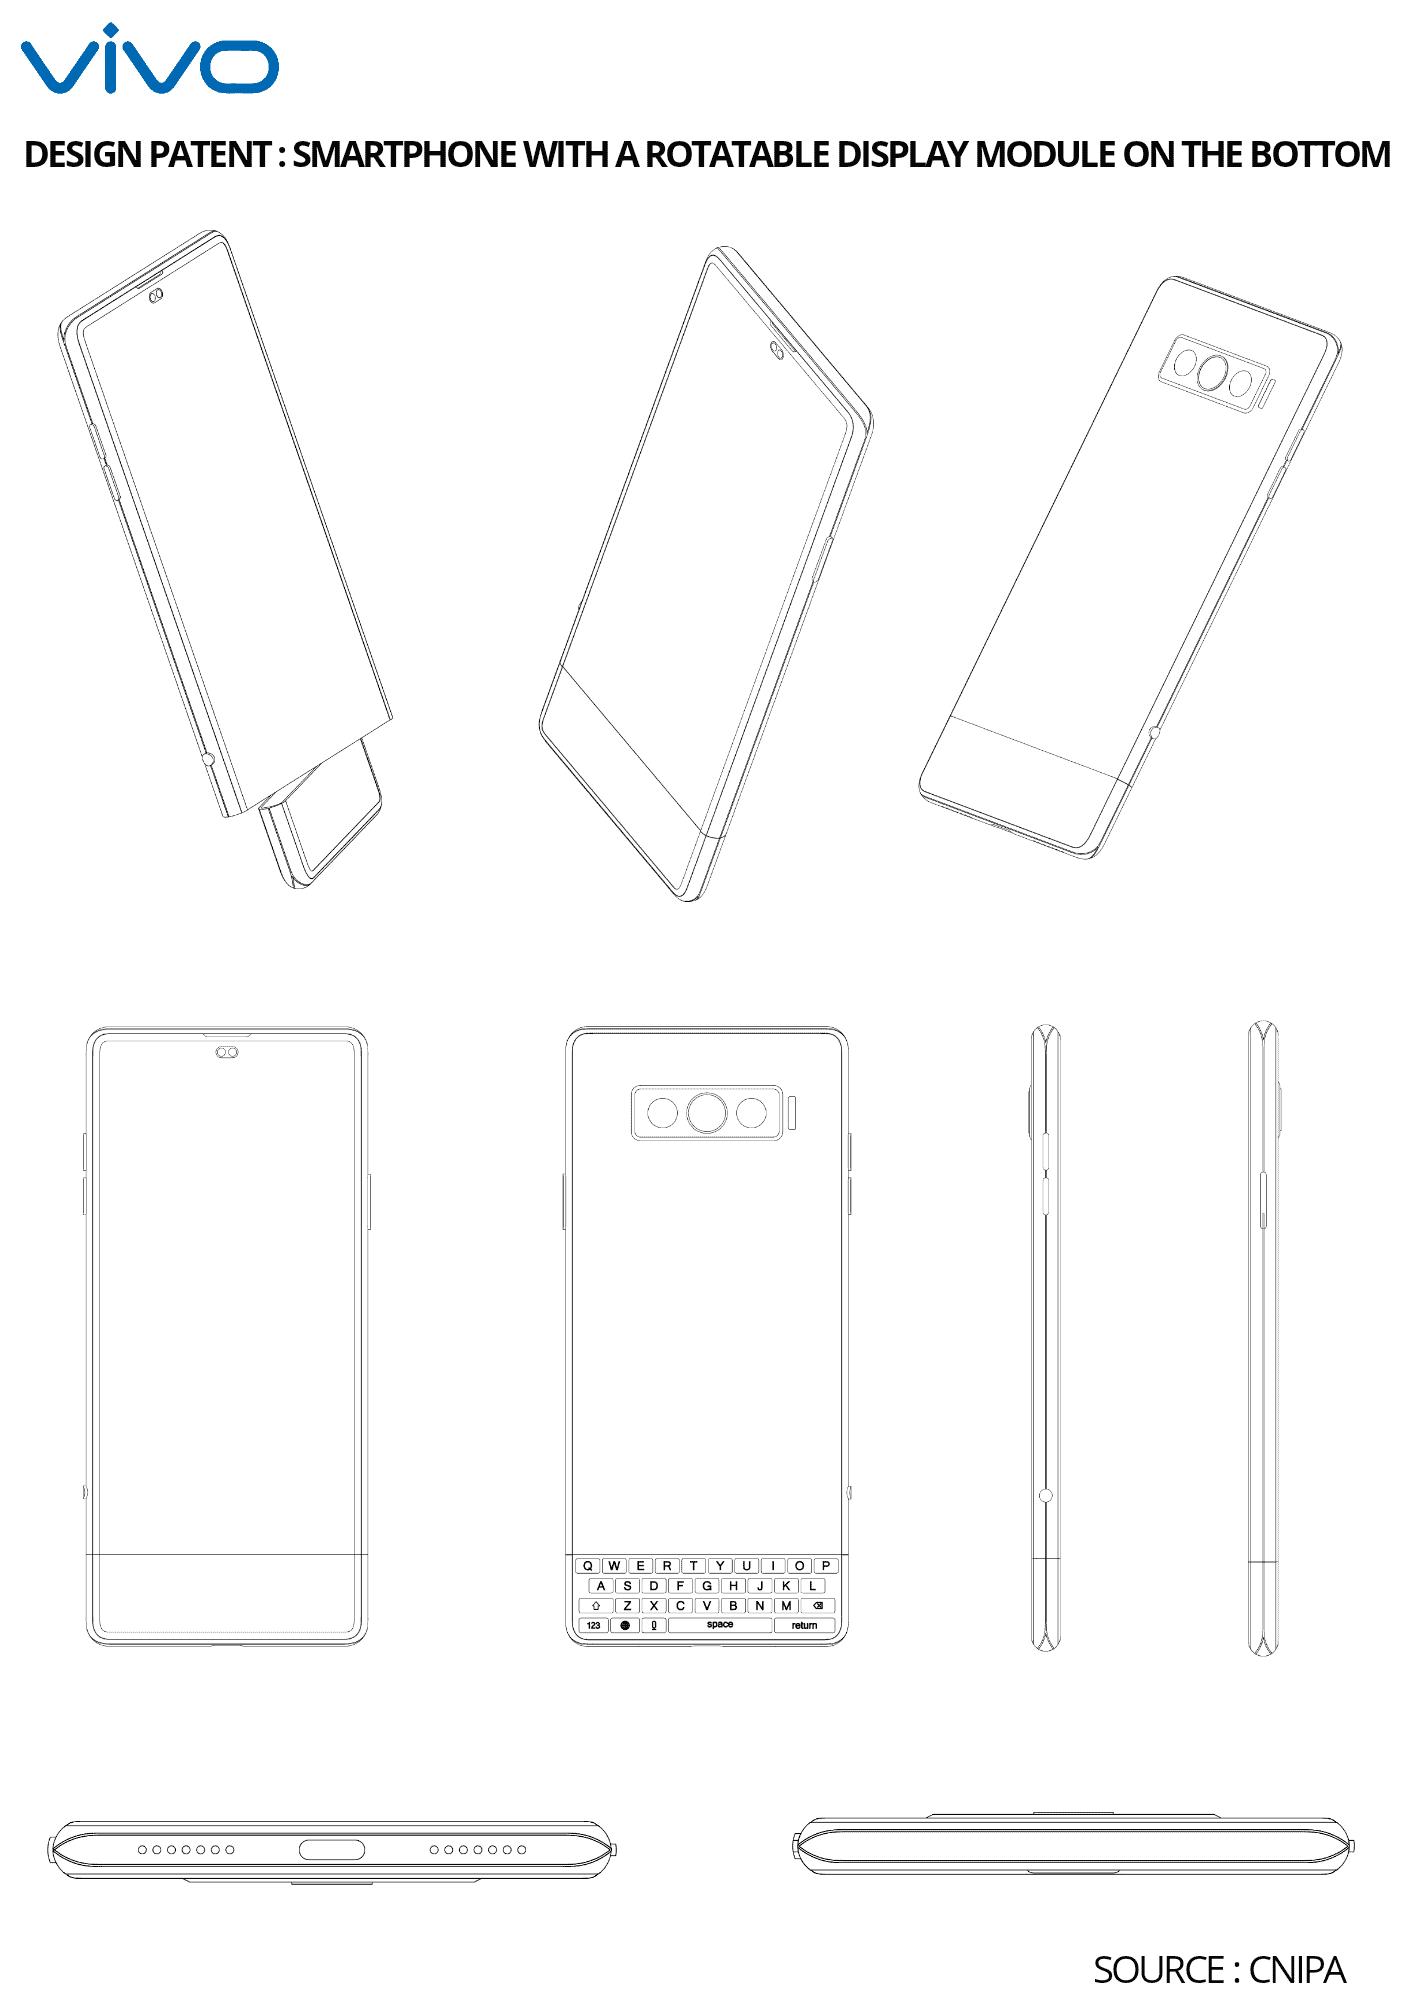 vivo patent